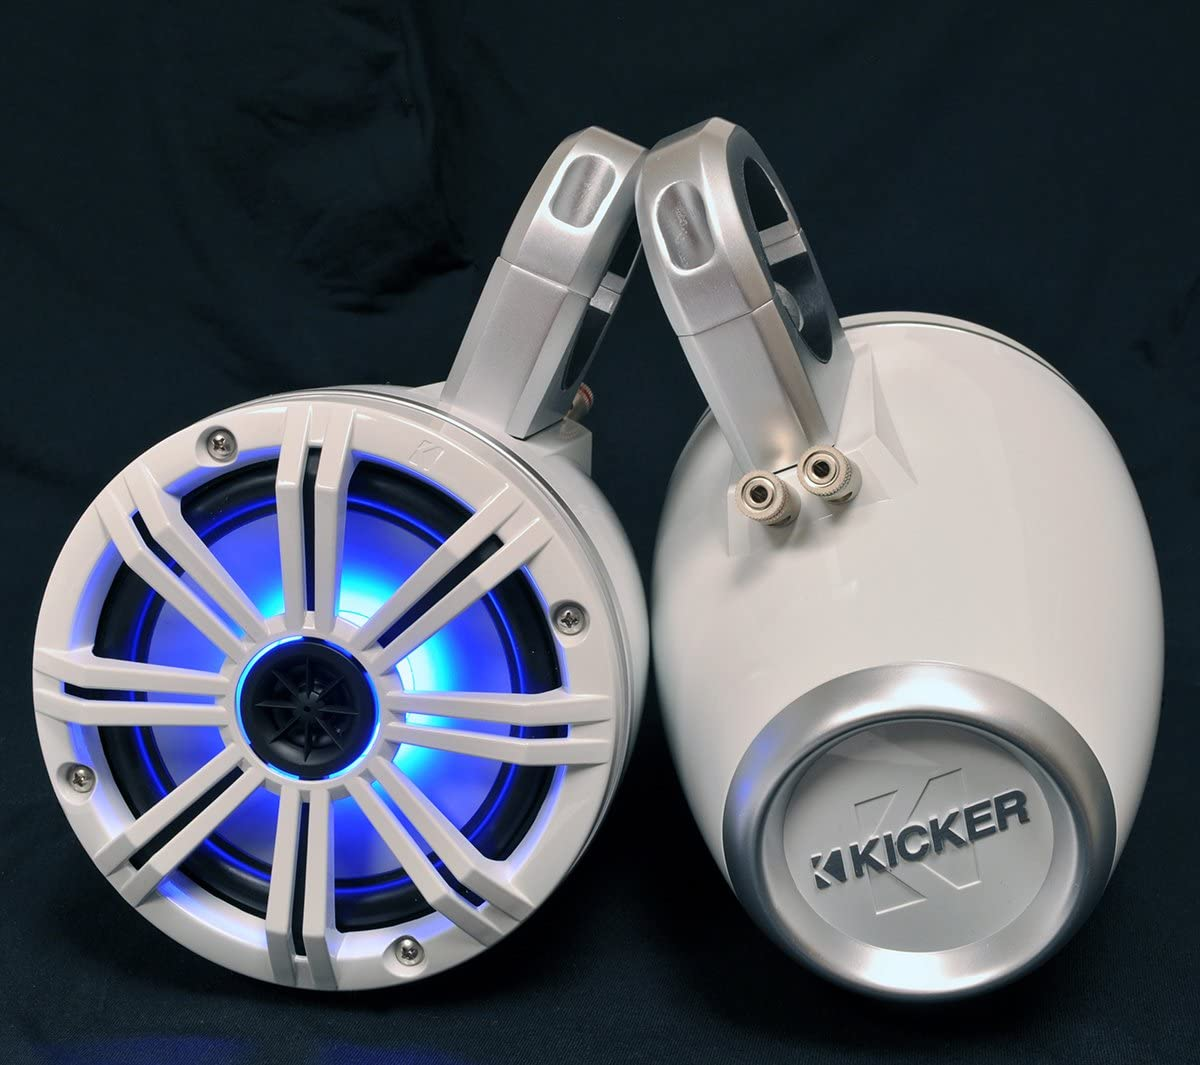 Pair Kicker White Wake Tower System with 6.5 Marine RGB LED Speakers